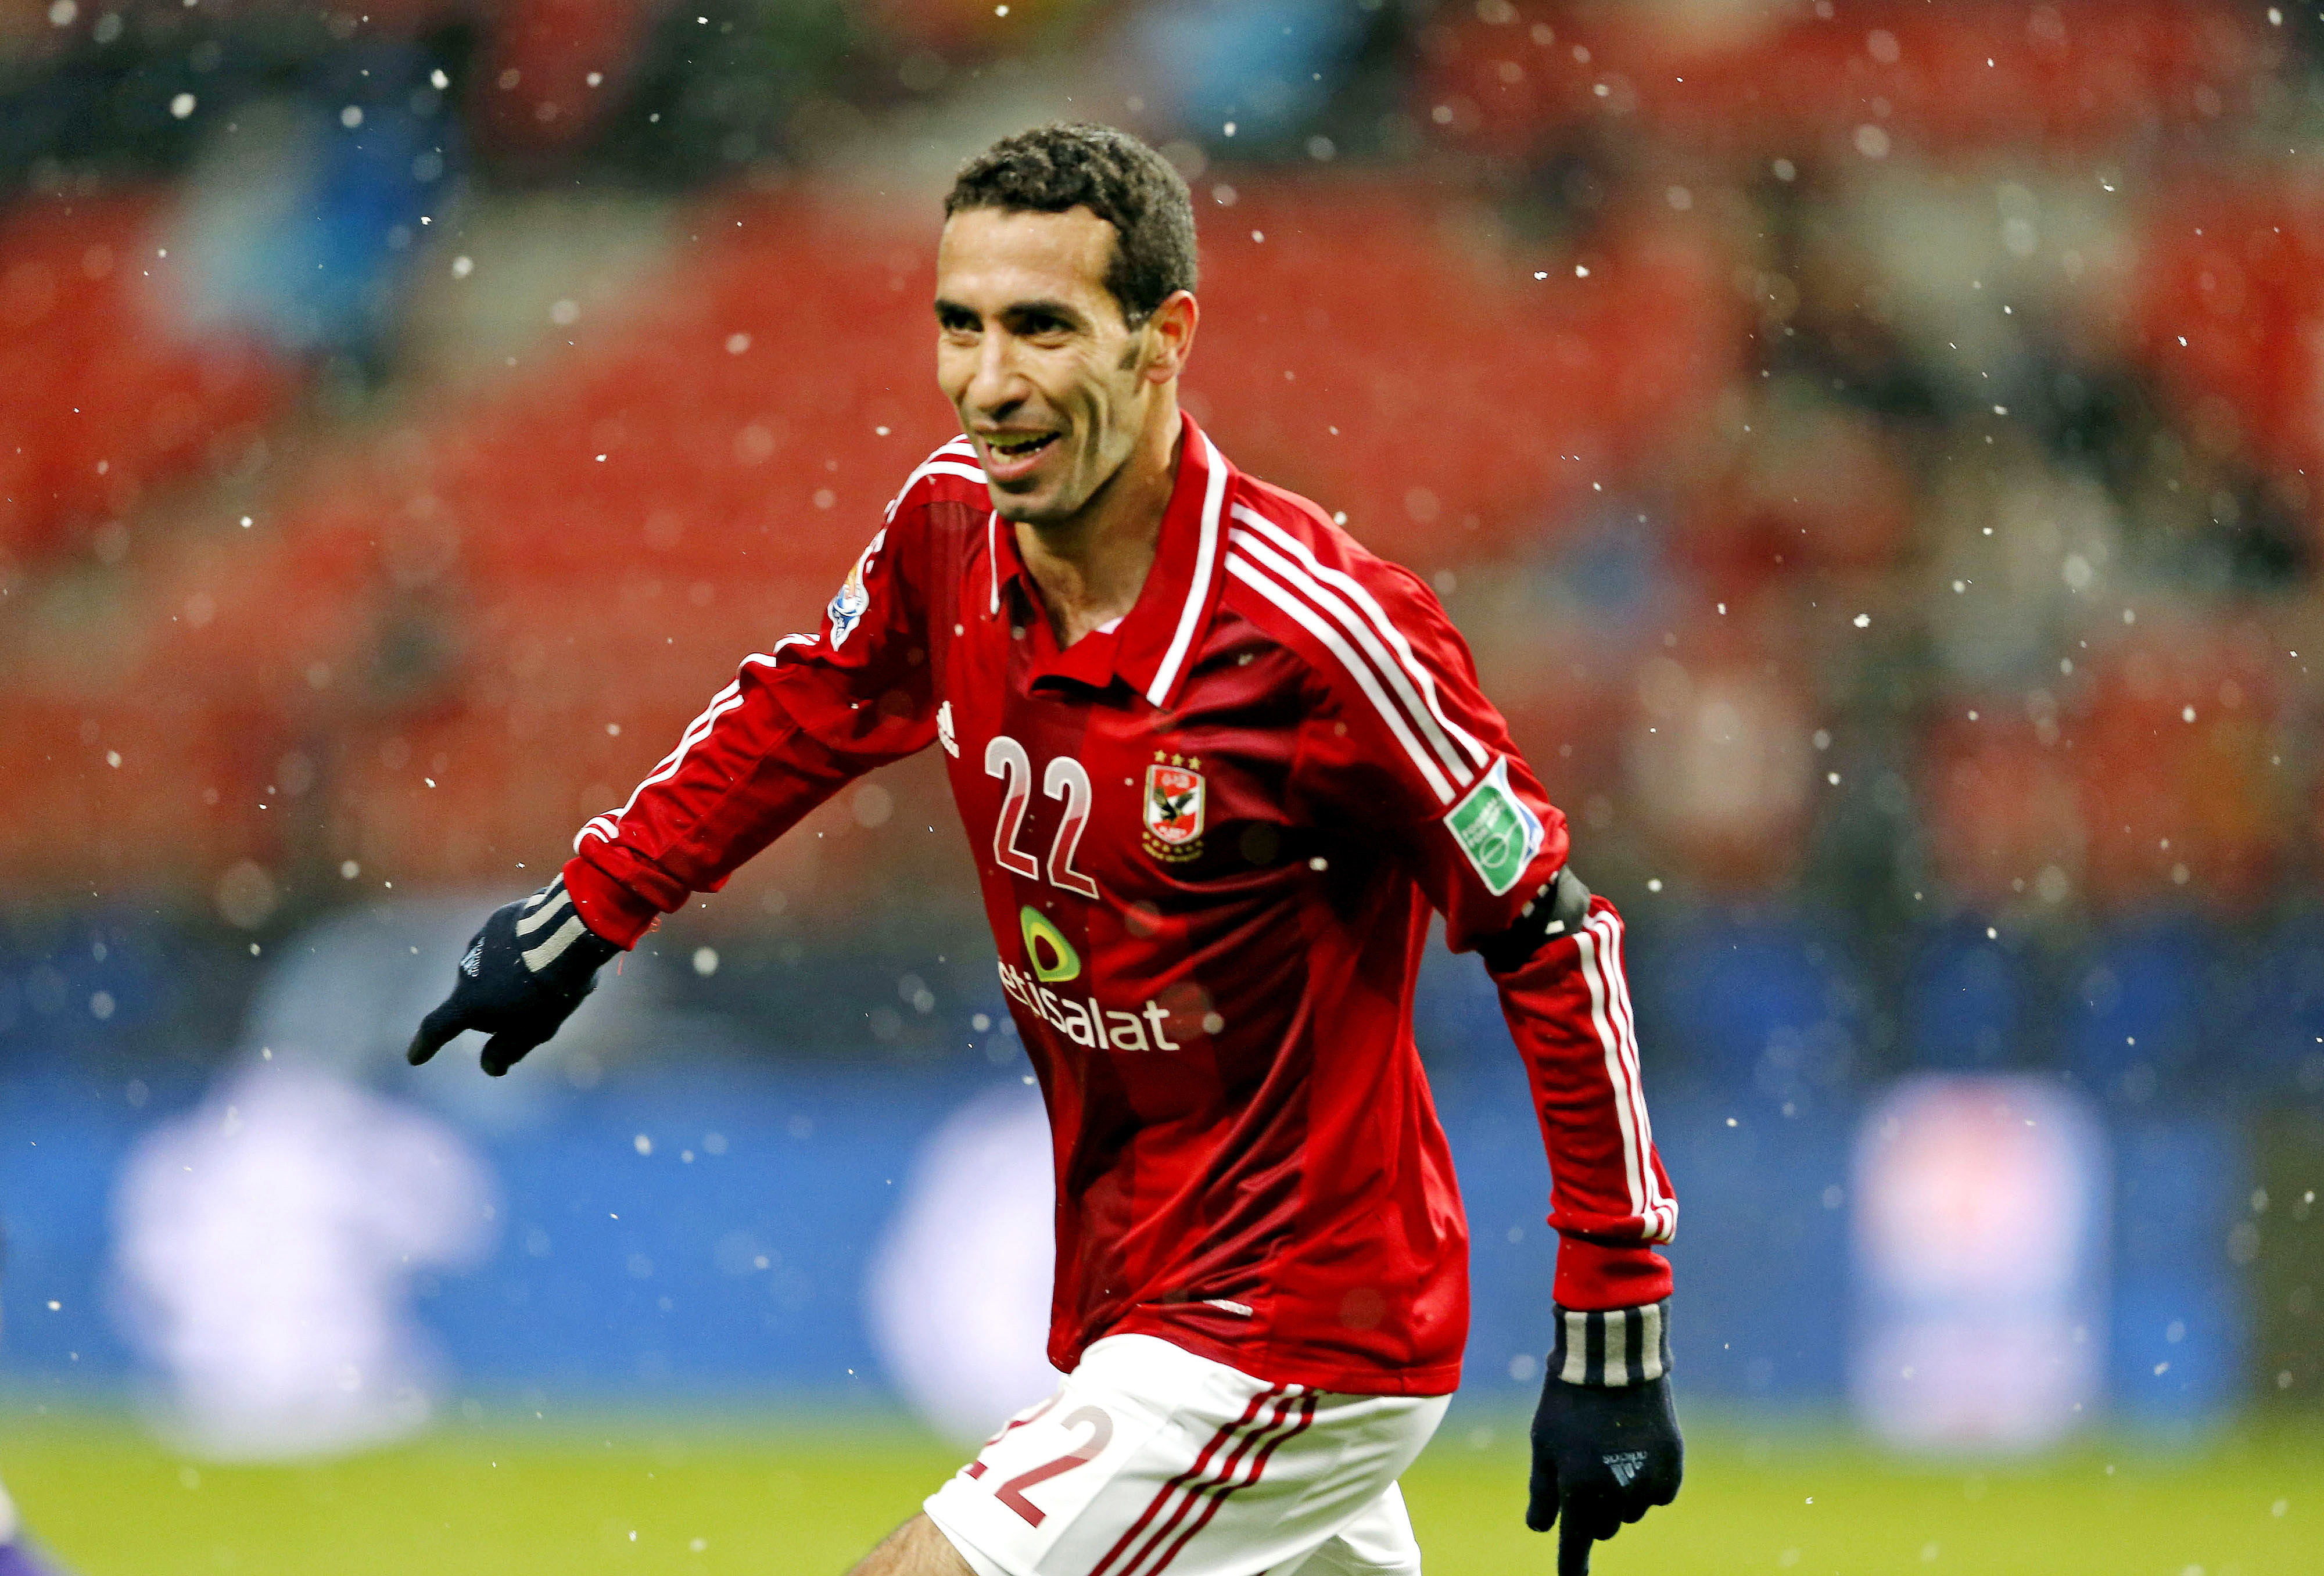 Egypt's retired soccer star sentenced to 1 year in prison